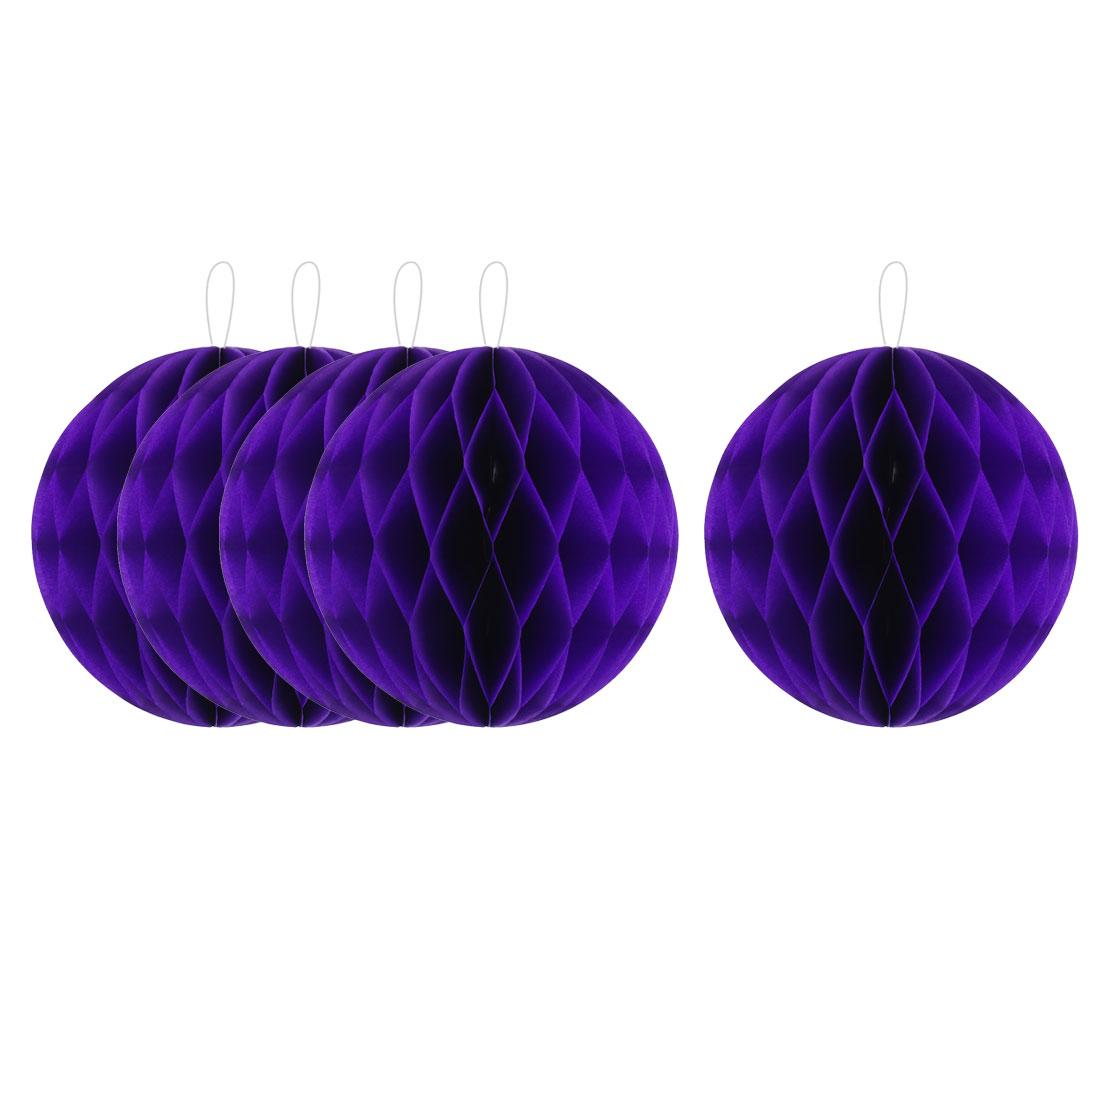 Party Paper DIY Craft Hanging Decor Honeycomb Ball Lantern Dark Purple 8 Inches 5pcs